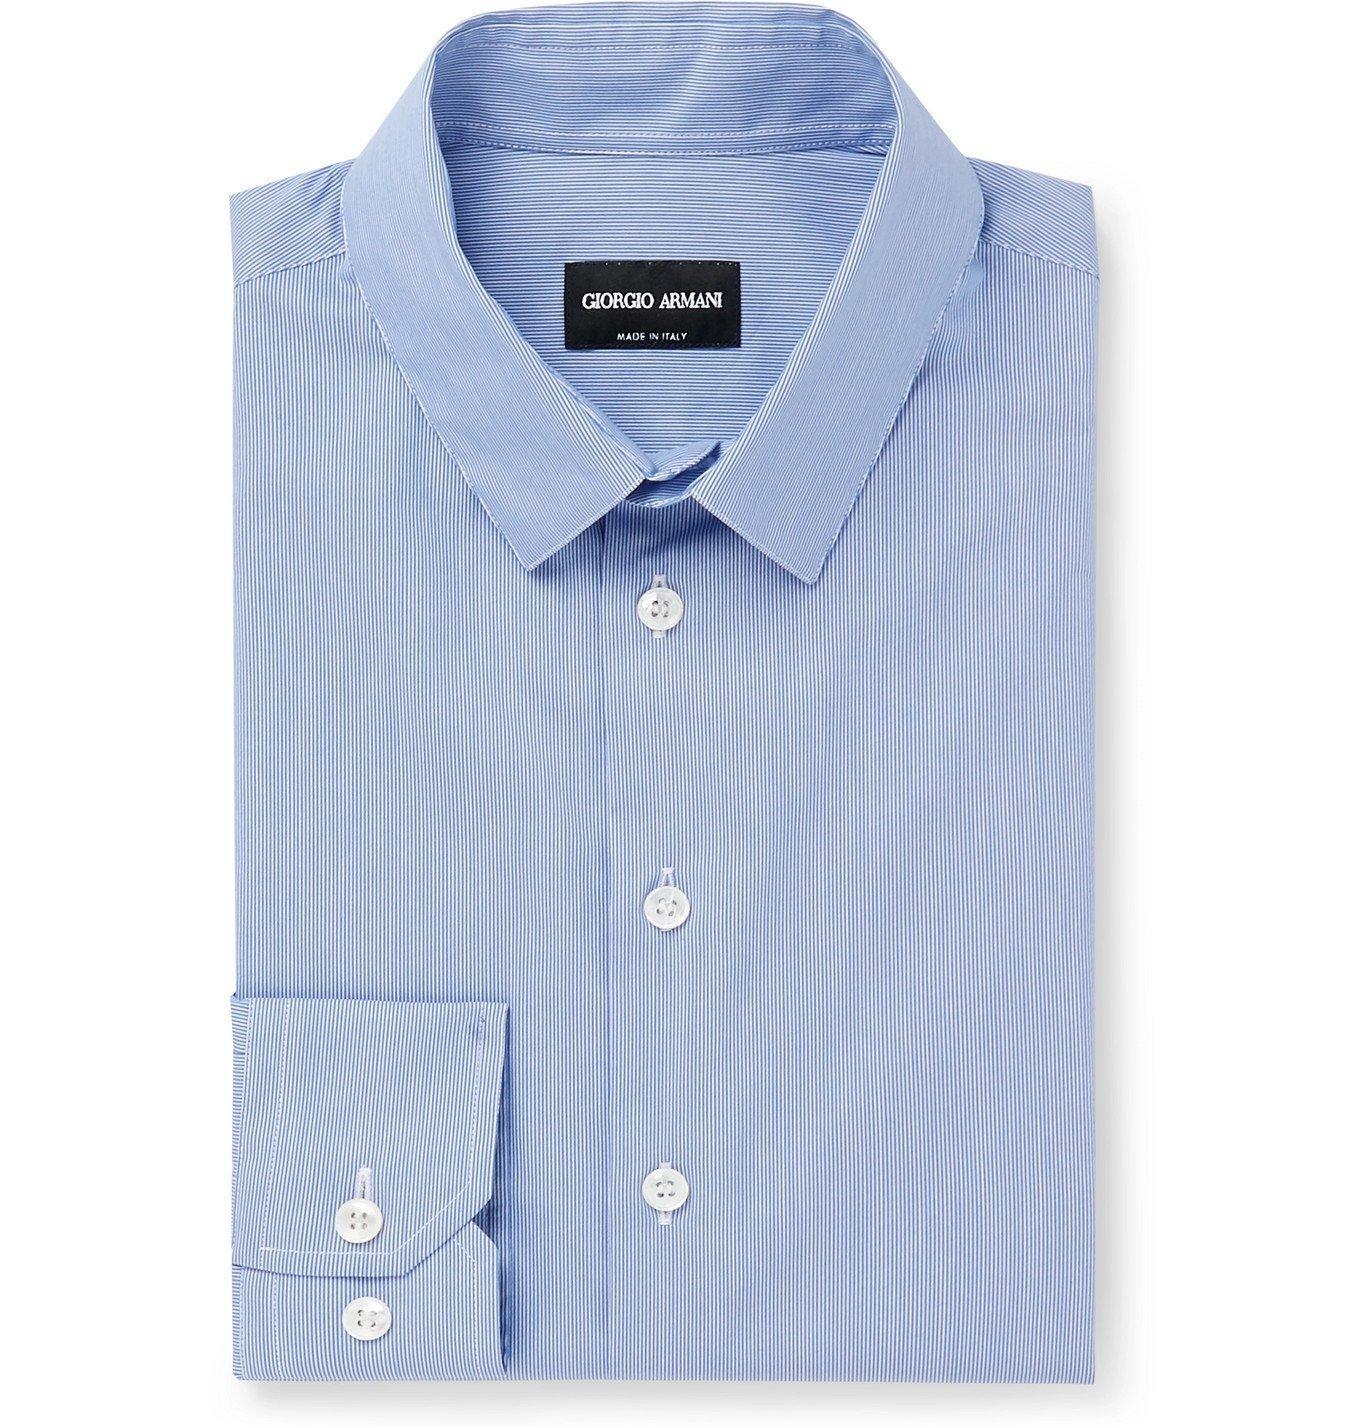 Giorgio Armani - Slim-Fit Pinstriped Cotton-Blend Poplin Shirt - Blue